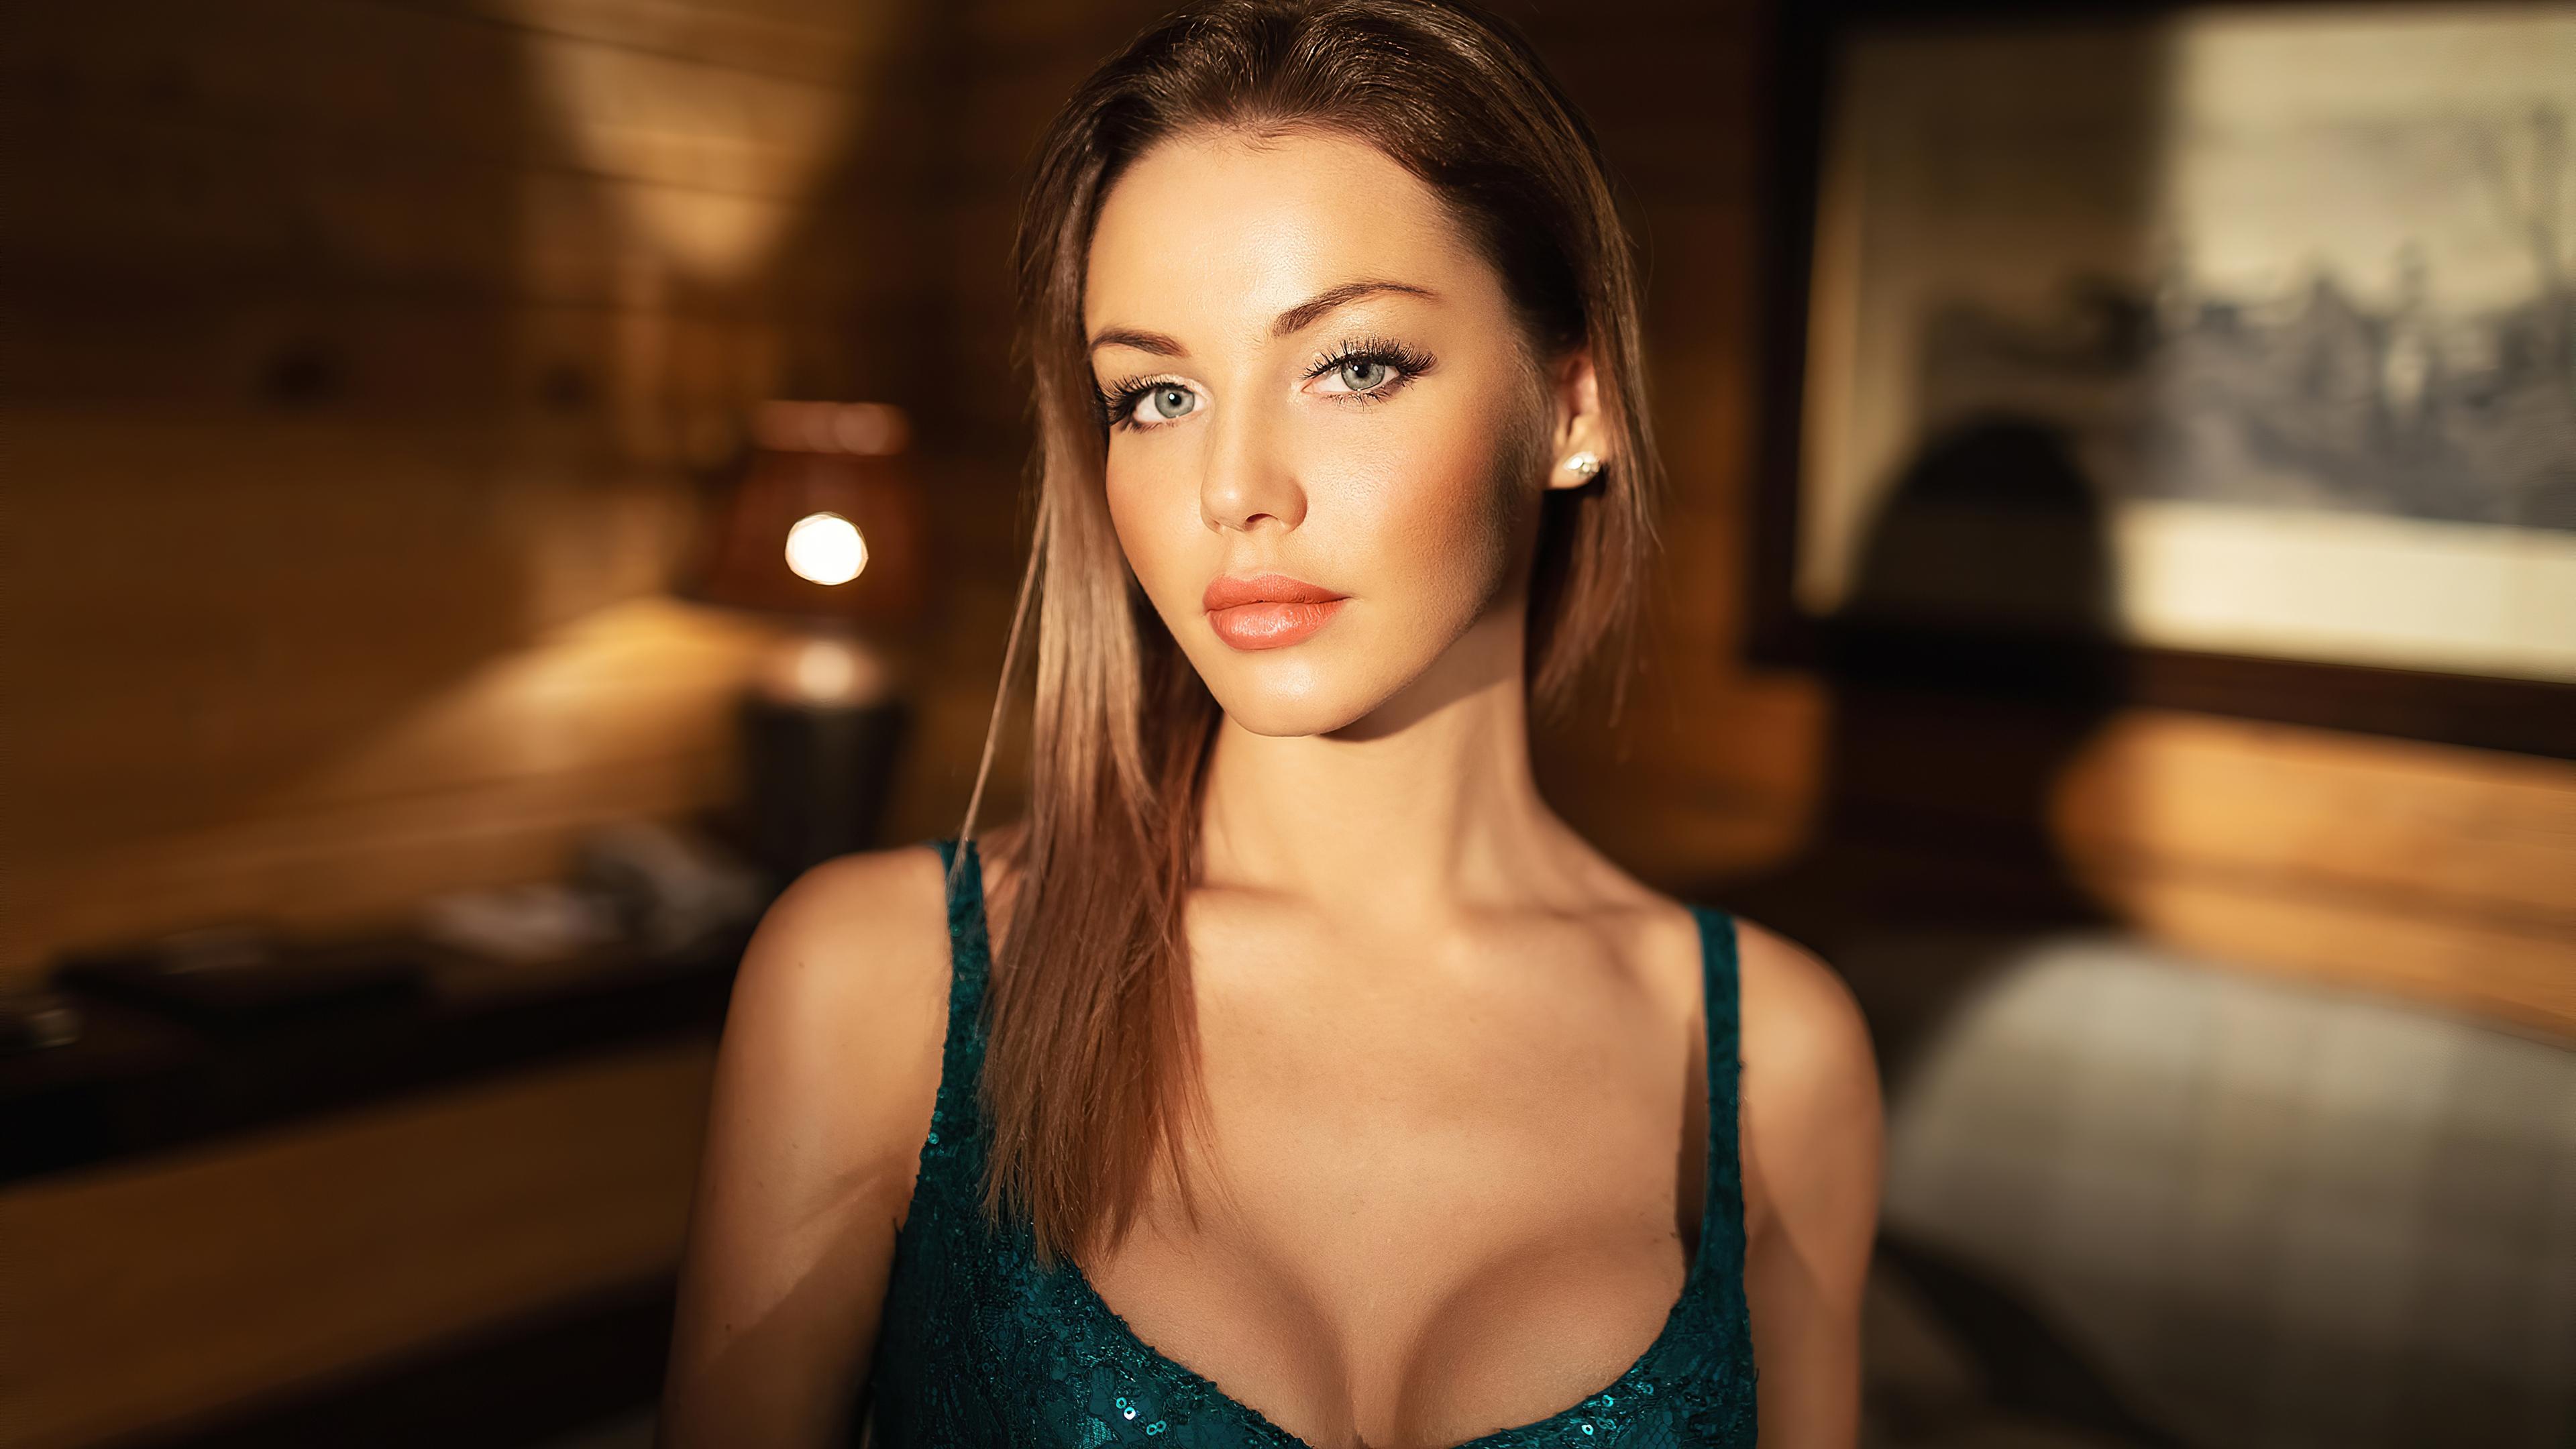 girl-face-depth-looking-at-viewer-4k-el-